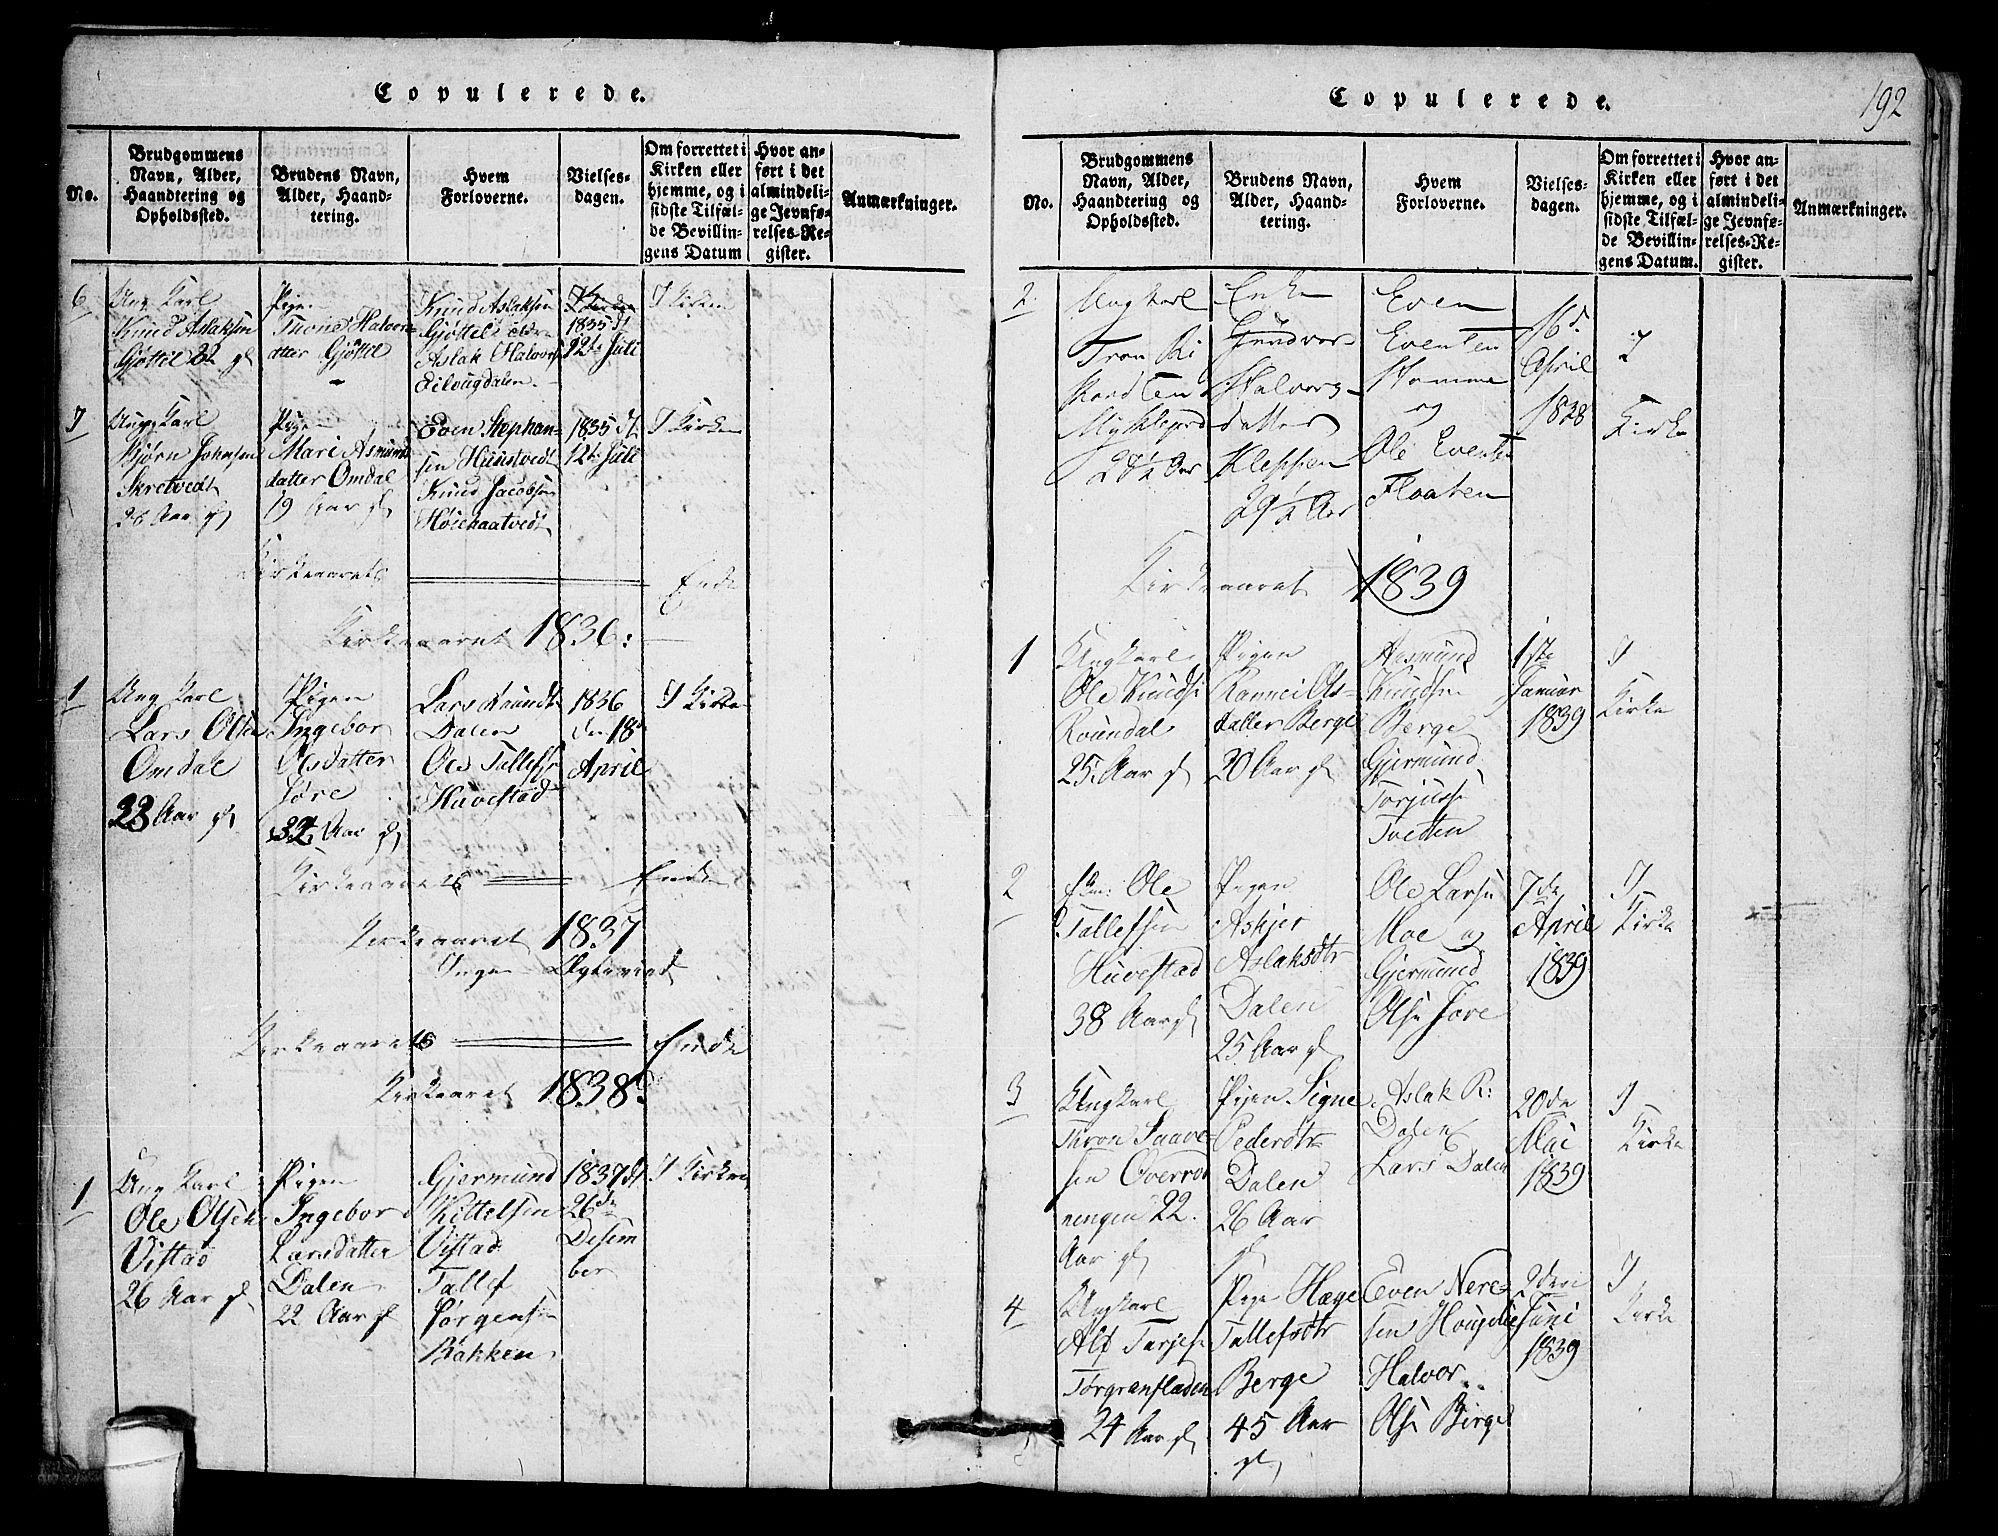 SAKO, Lårdal kirkebøker, G/Gb/L0001: Klokkerbok nr. II 1, 1815-1865, s. 192